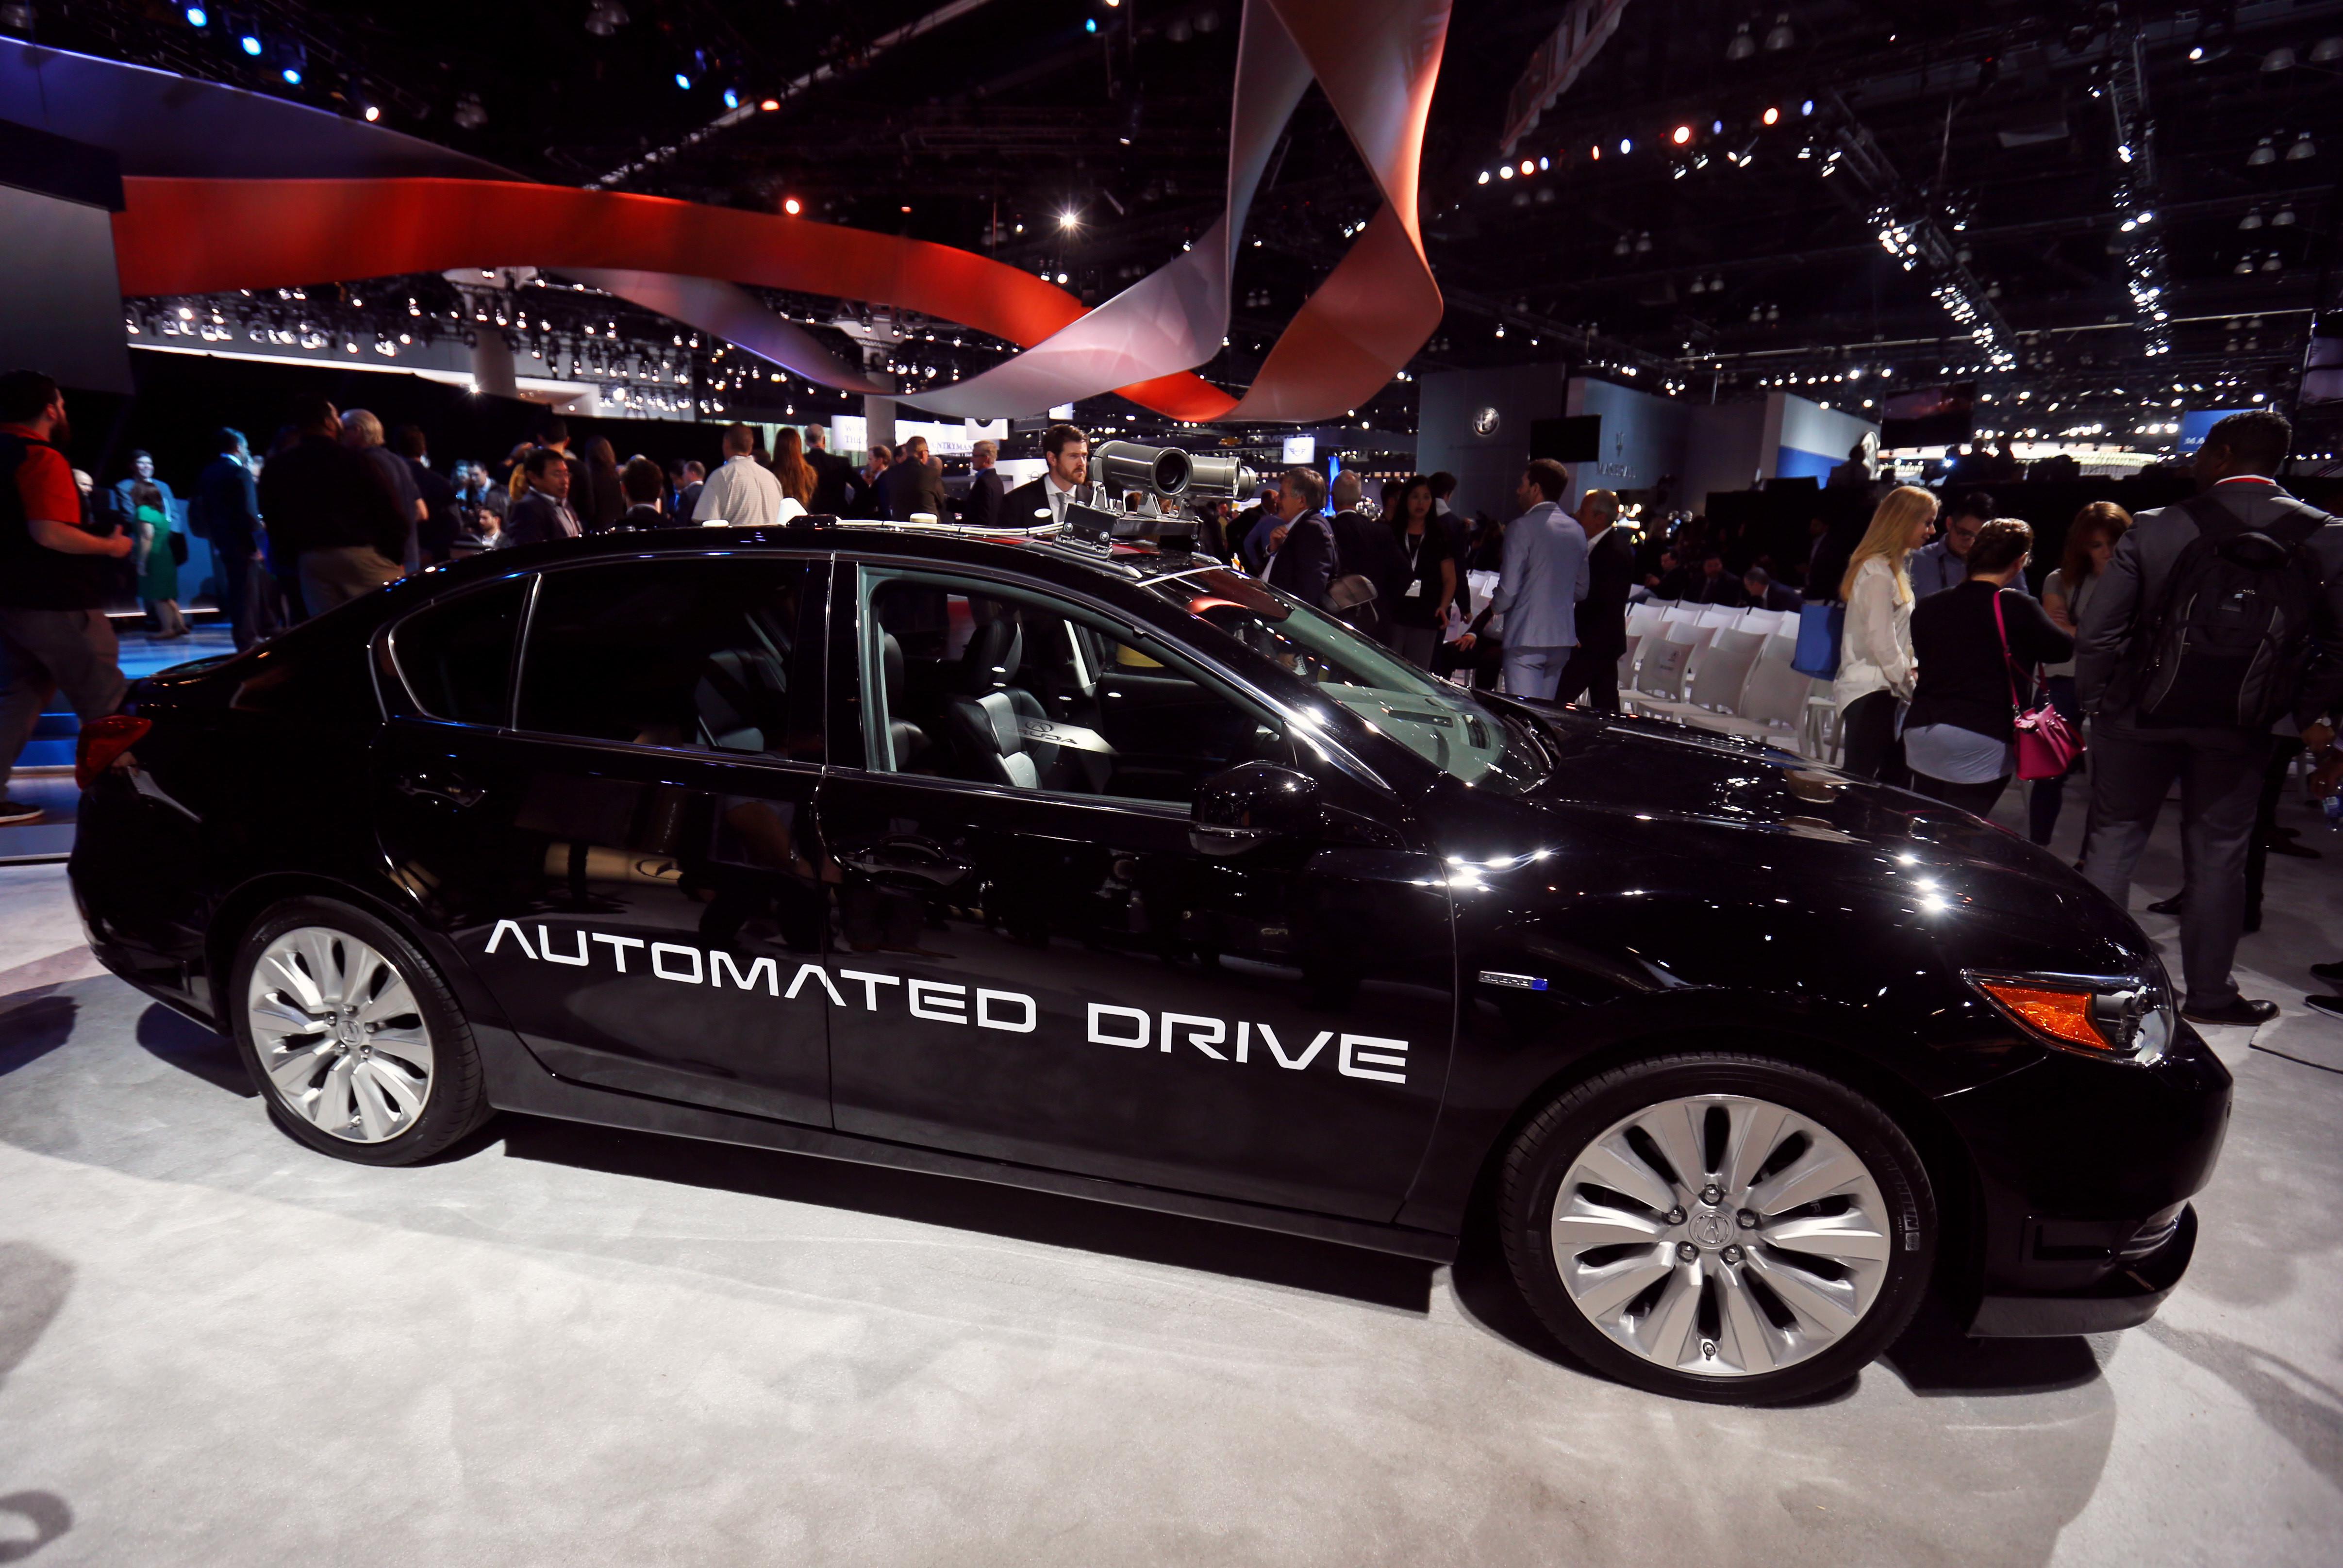 self driving cars autonomous vehicles automobile industry tech ai machine learning trust china us  india south korea  germny